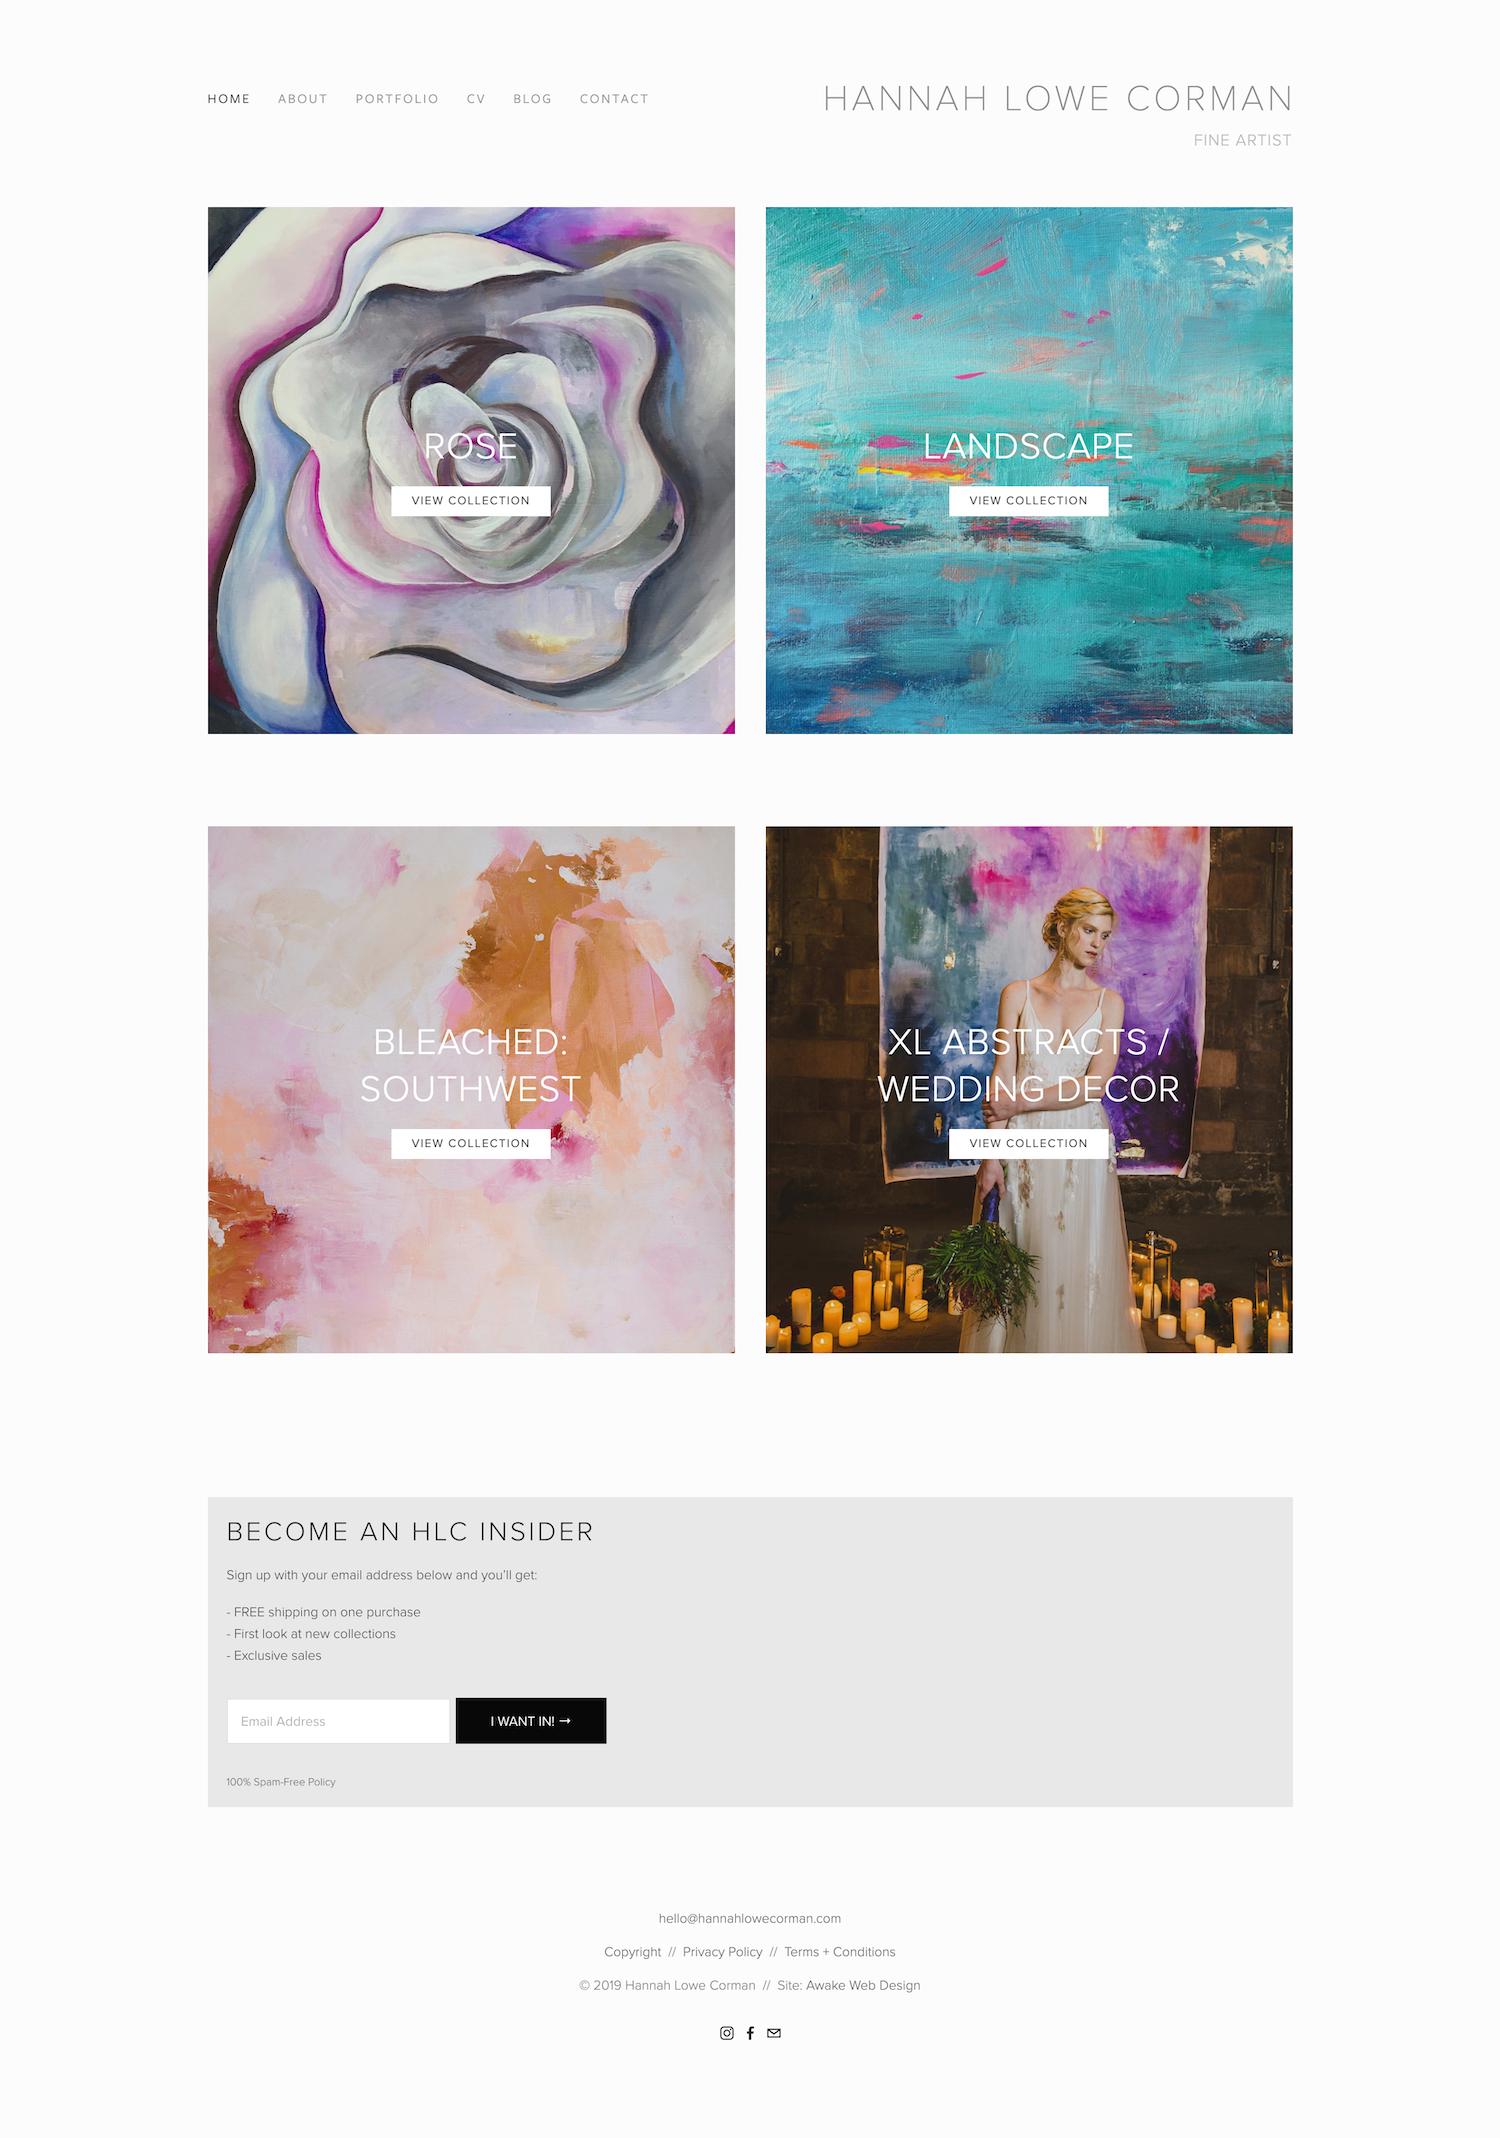 hannah-lowe-corman-awake-web-design-portfolio-2.jpg